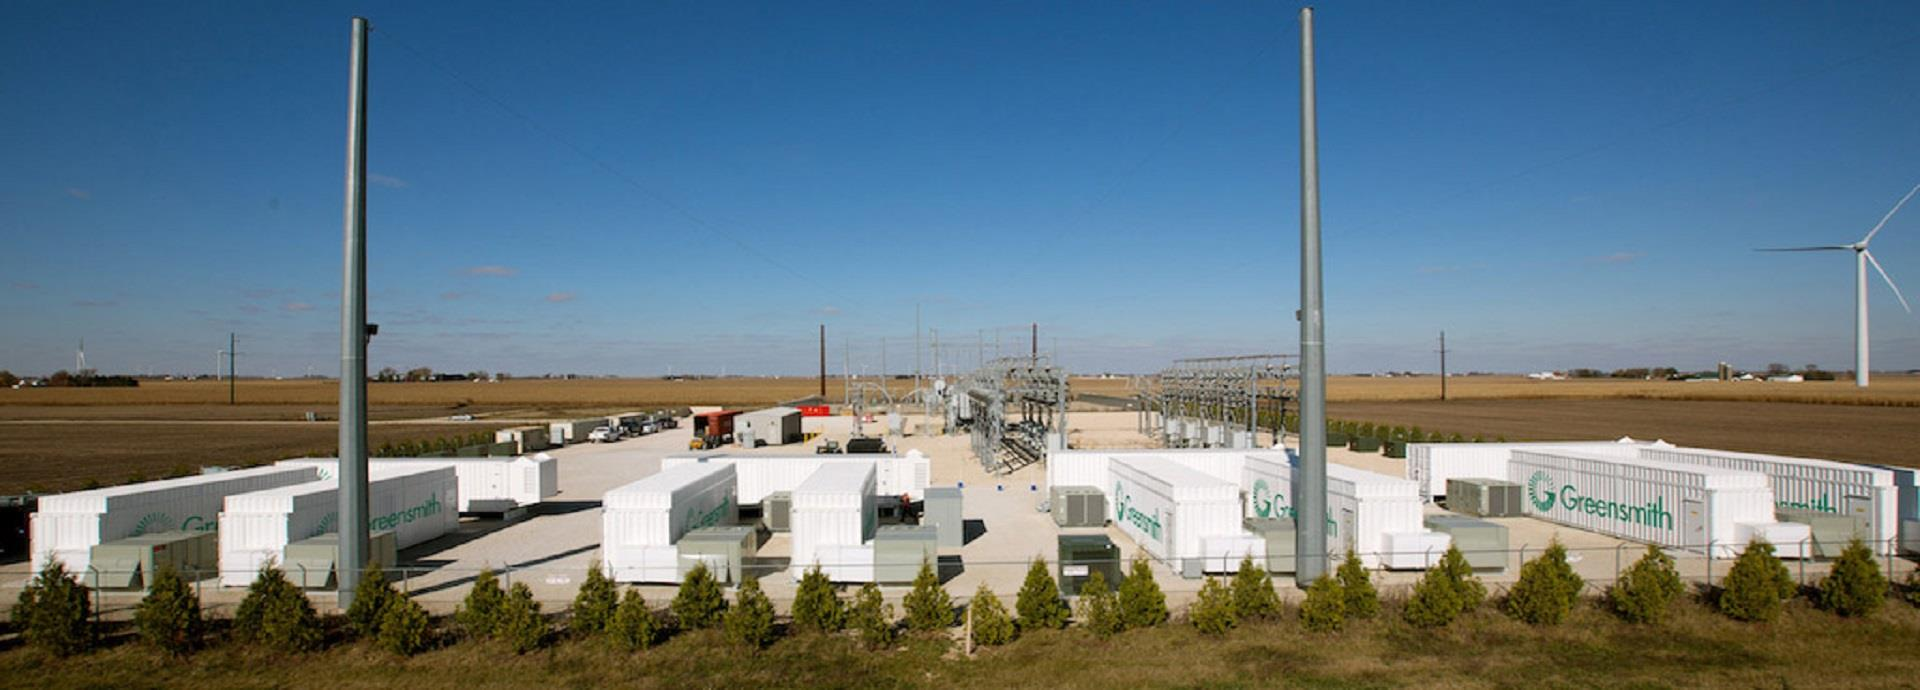 next-generation-energy-storage-systems_resized